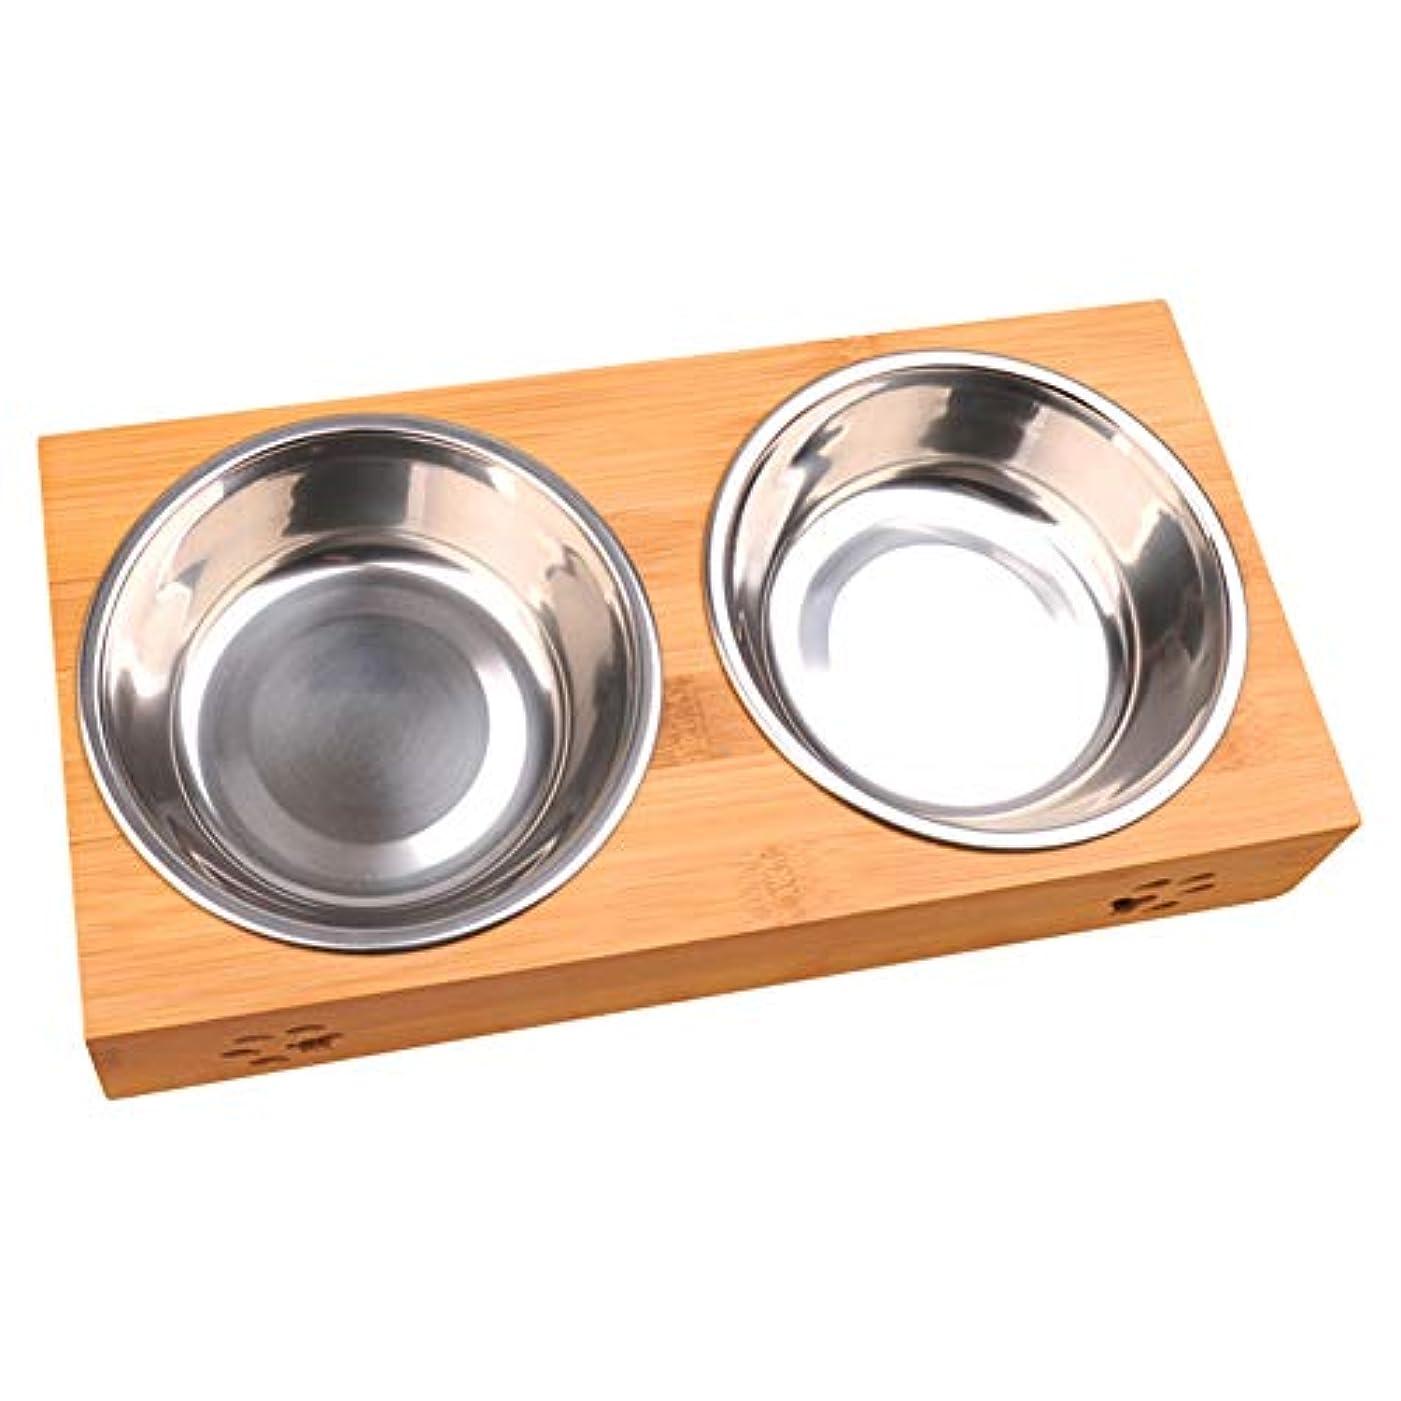 LIFE防水耐久性のある非毒性ペットボウル猫簡単にきれいな犬皿ダブル食品水スタンドフィーダ食器ステンレス鋼ペット食器